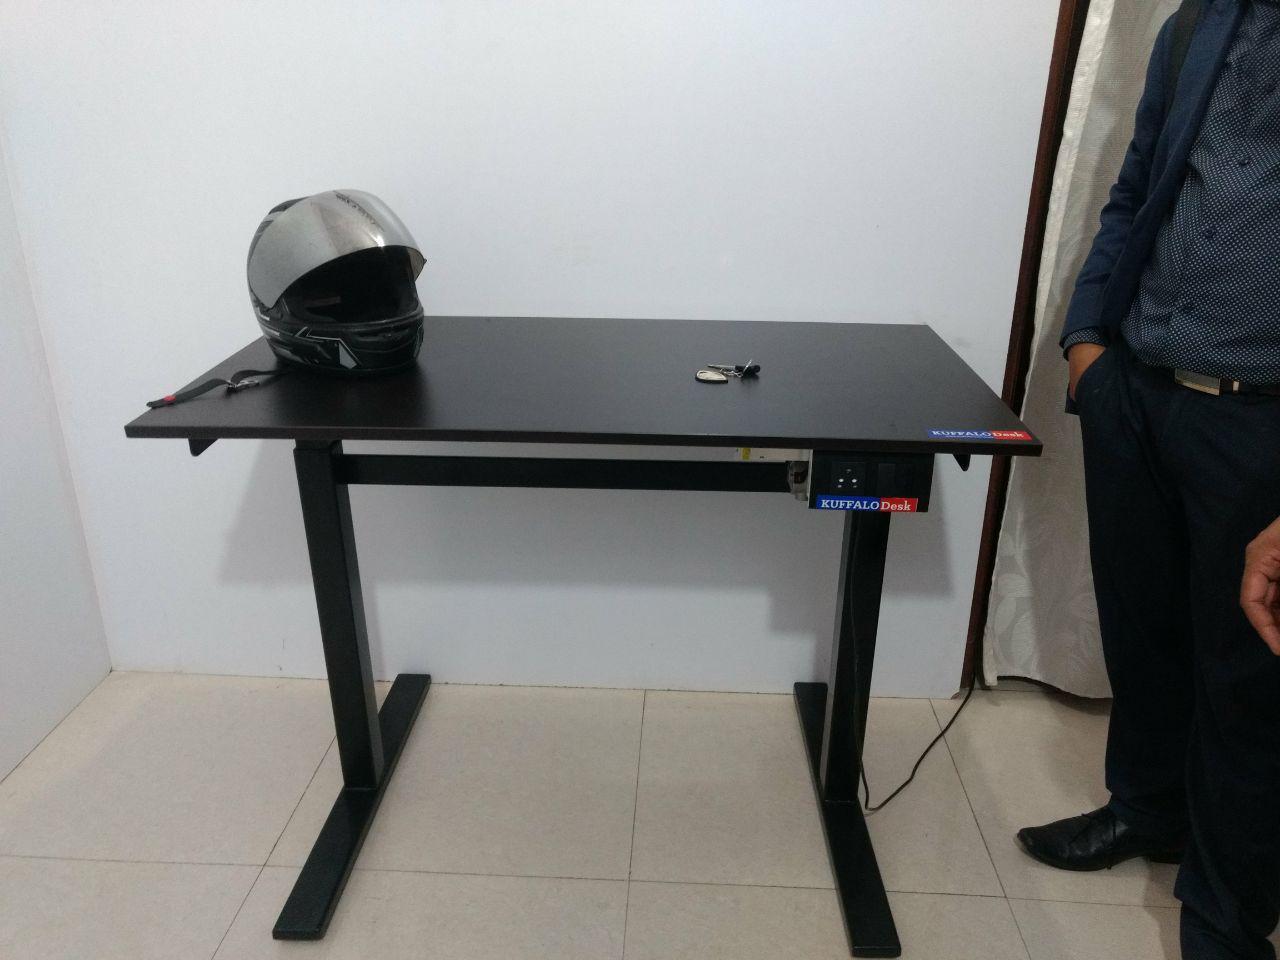 Kuffalo desk